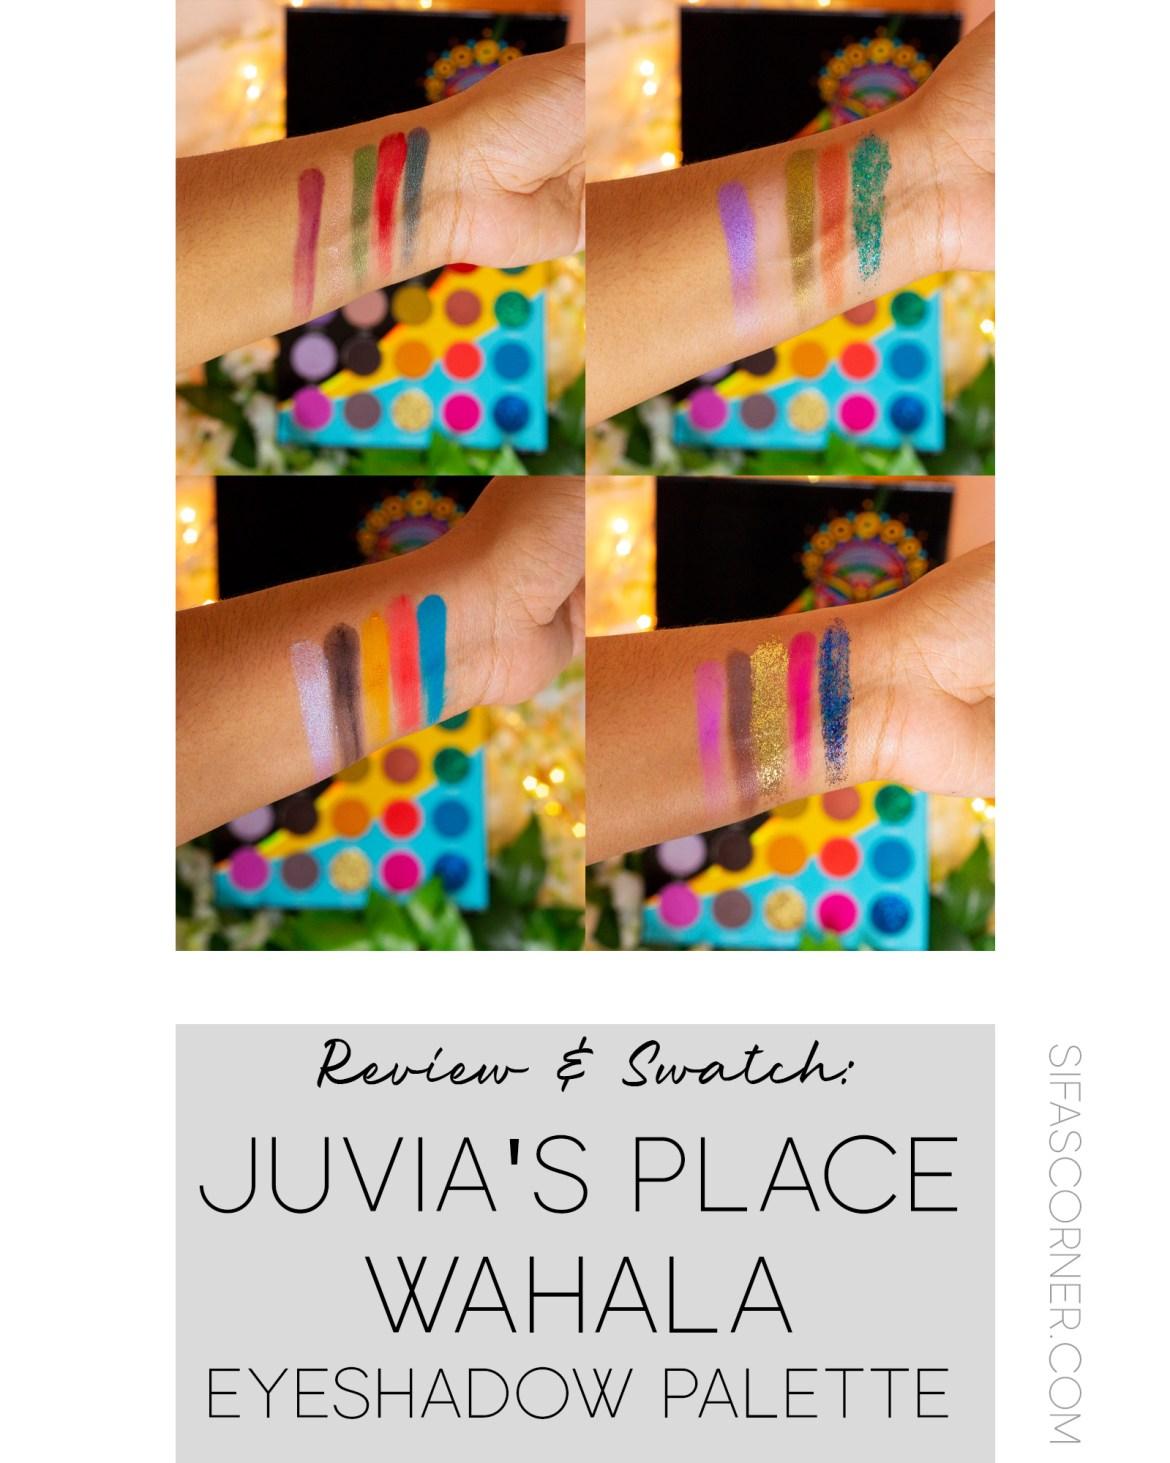 Juvia's Place WAHALA